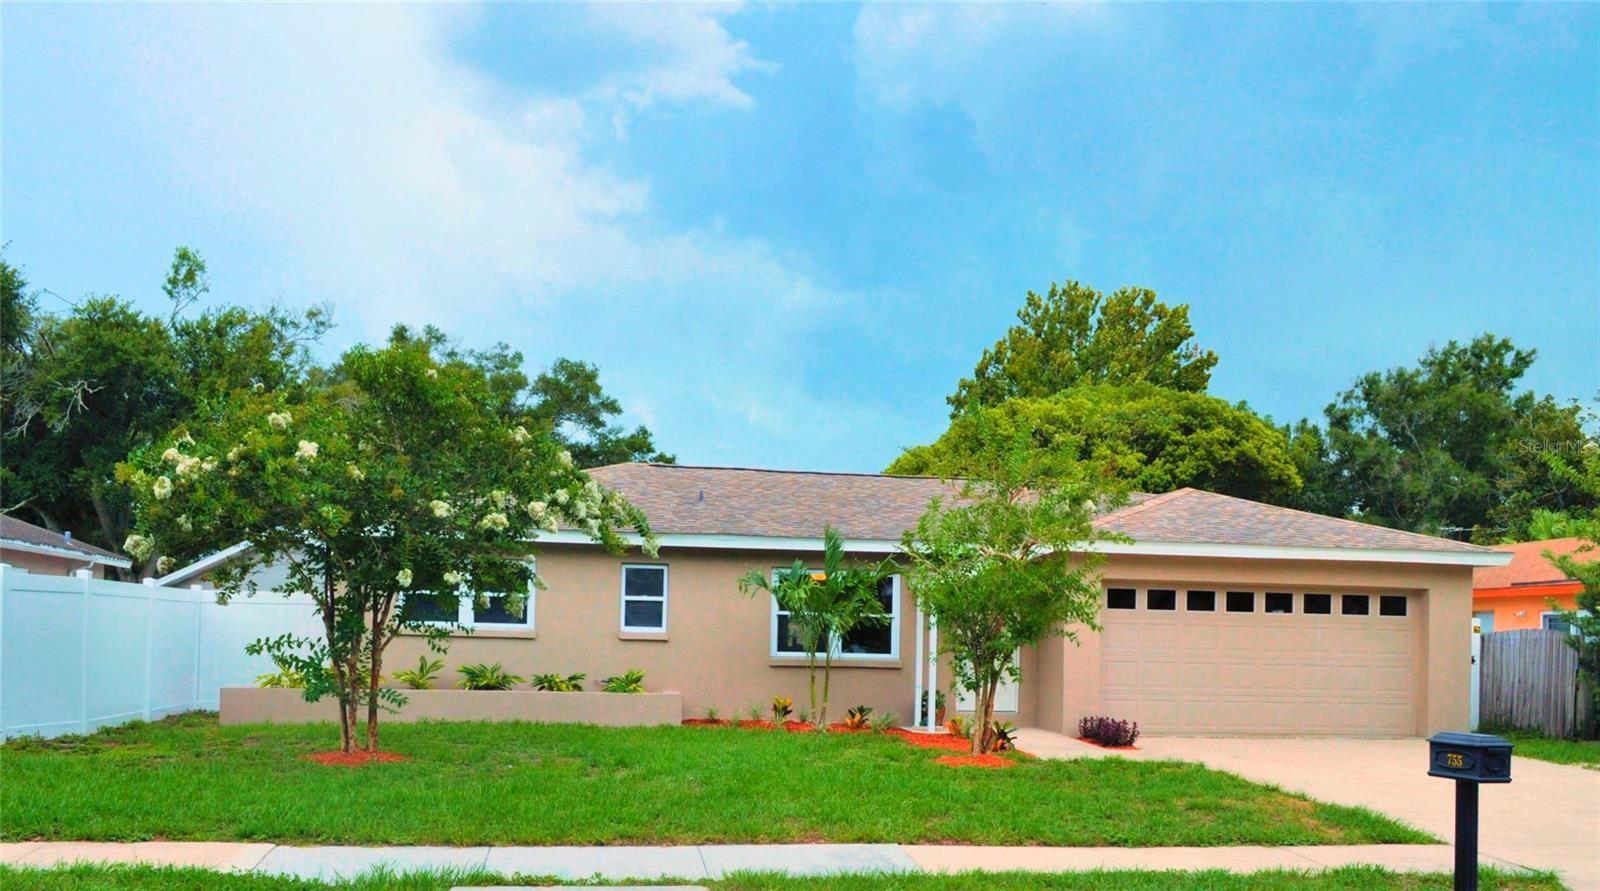 755 GREEN VALLEY ROAD, Palm Harbor, FL 34683 - #: U8128973